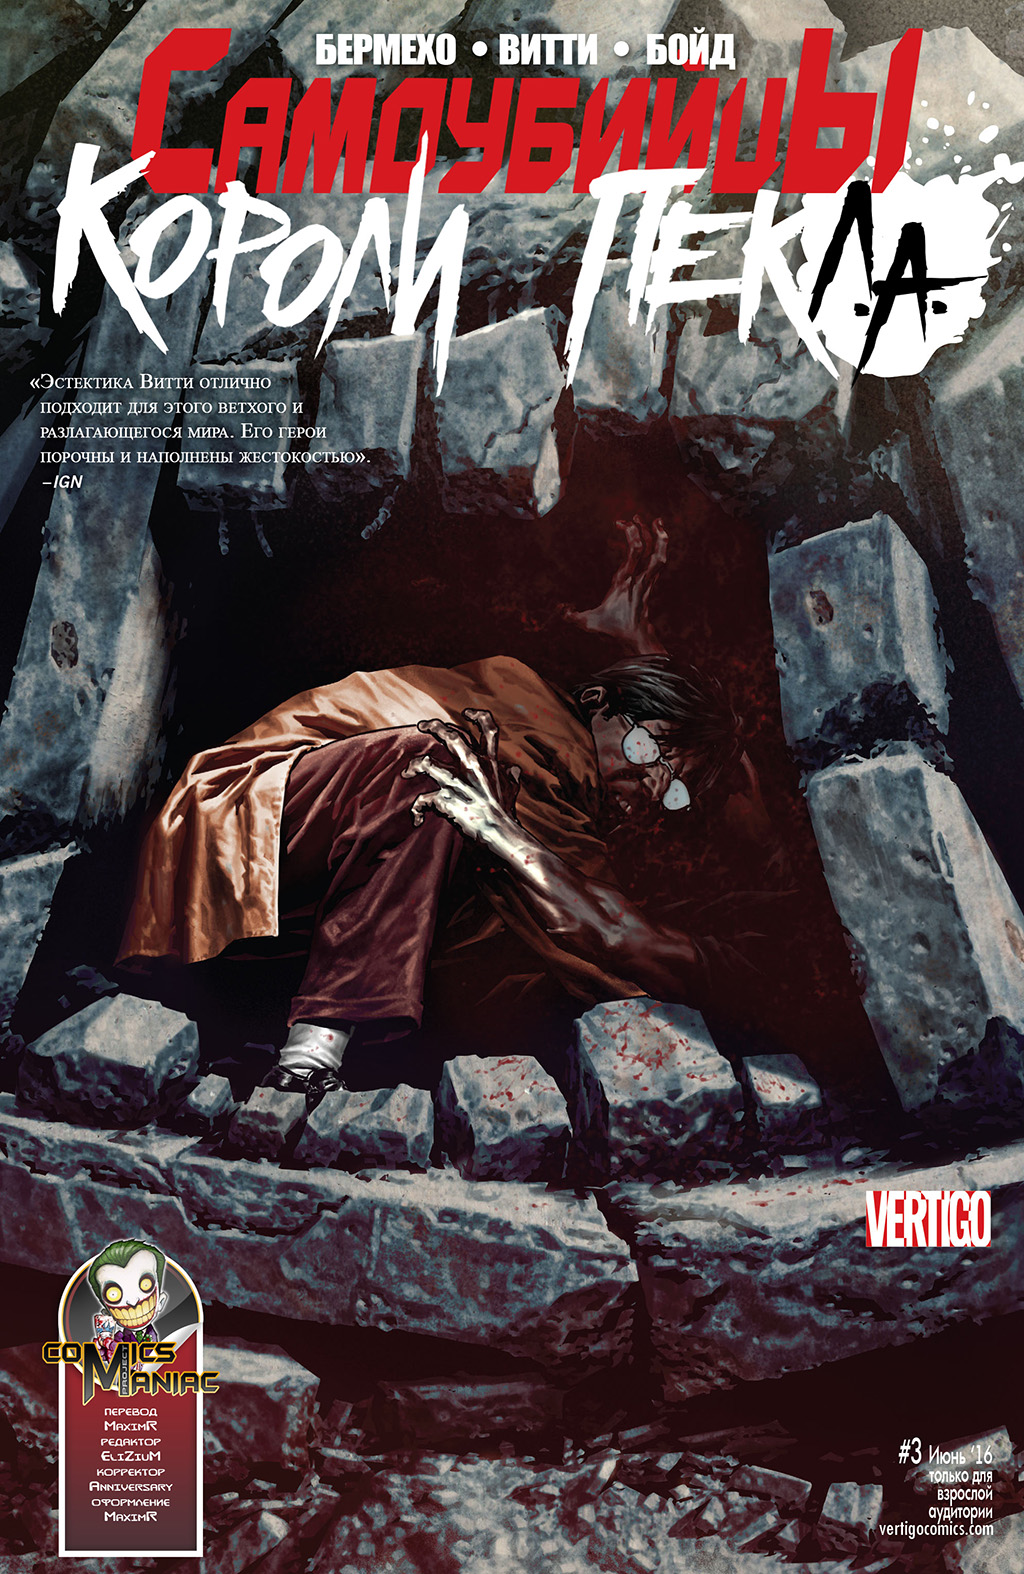 Комикс Самоубийцы: Короли ПекЛ.А.